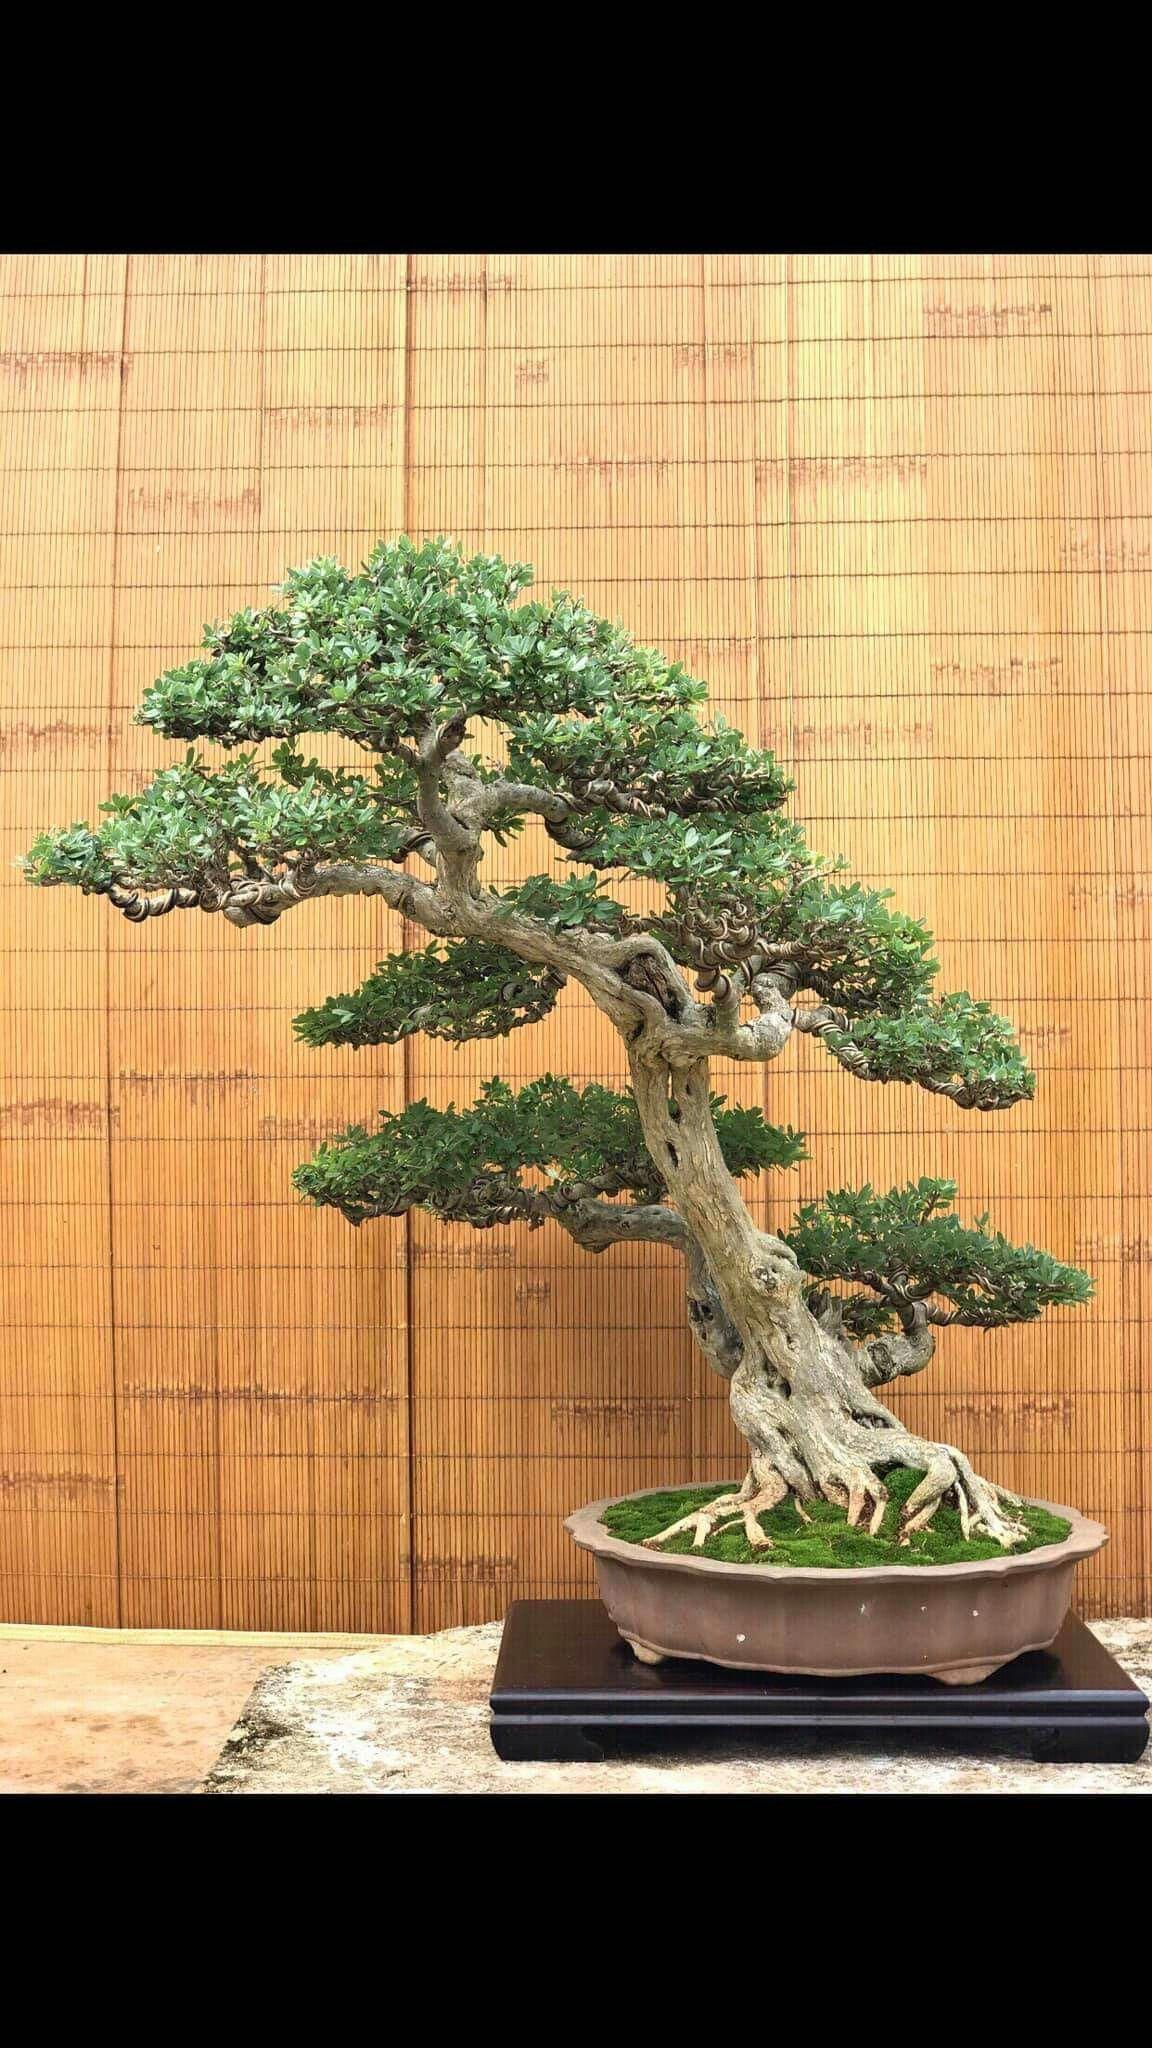 Pin By Jerry Turnbull On Bonsai Bonsai Tree Bonsai Tree Types